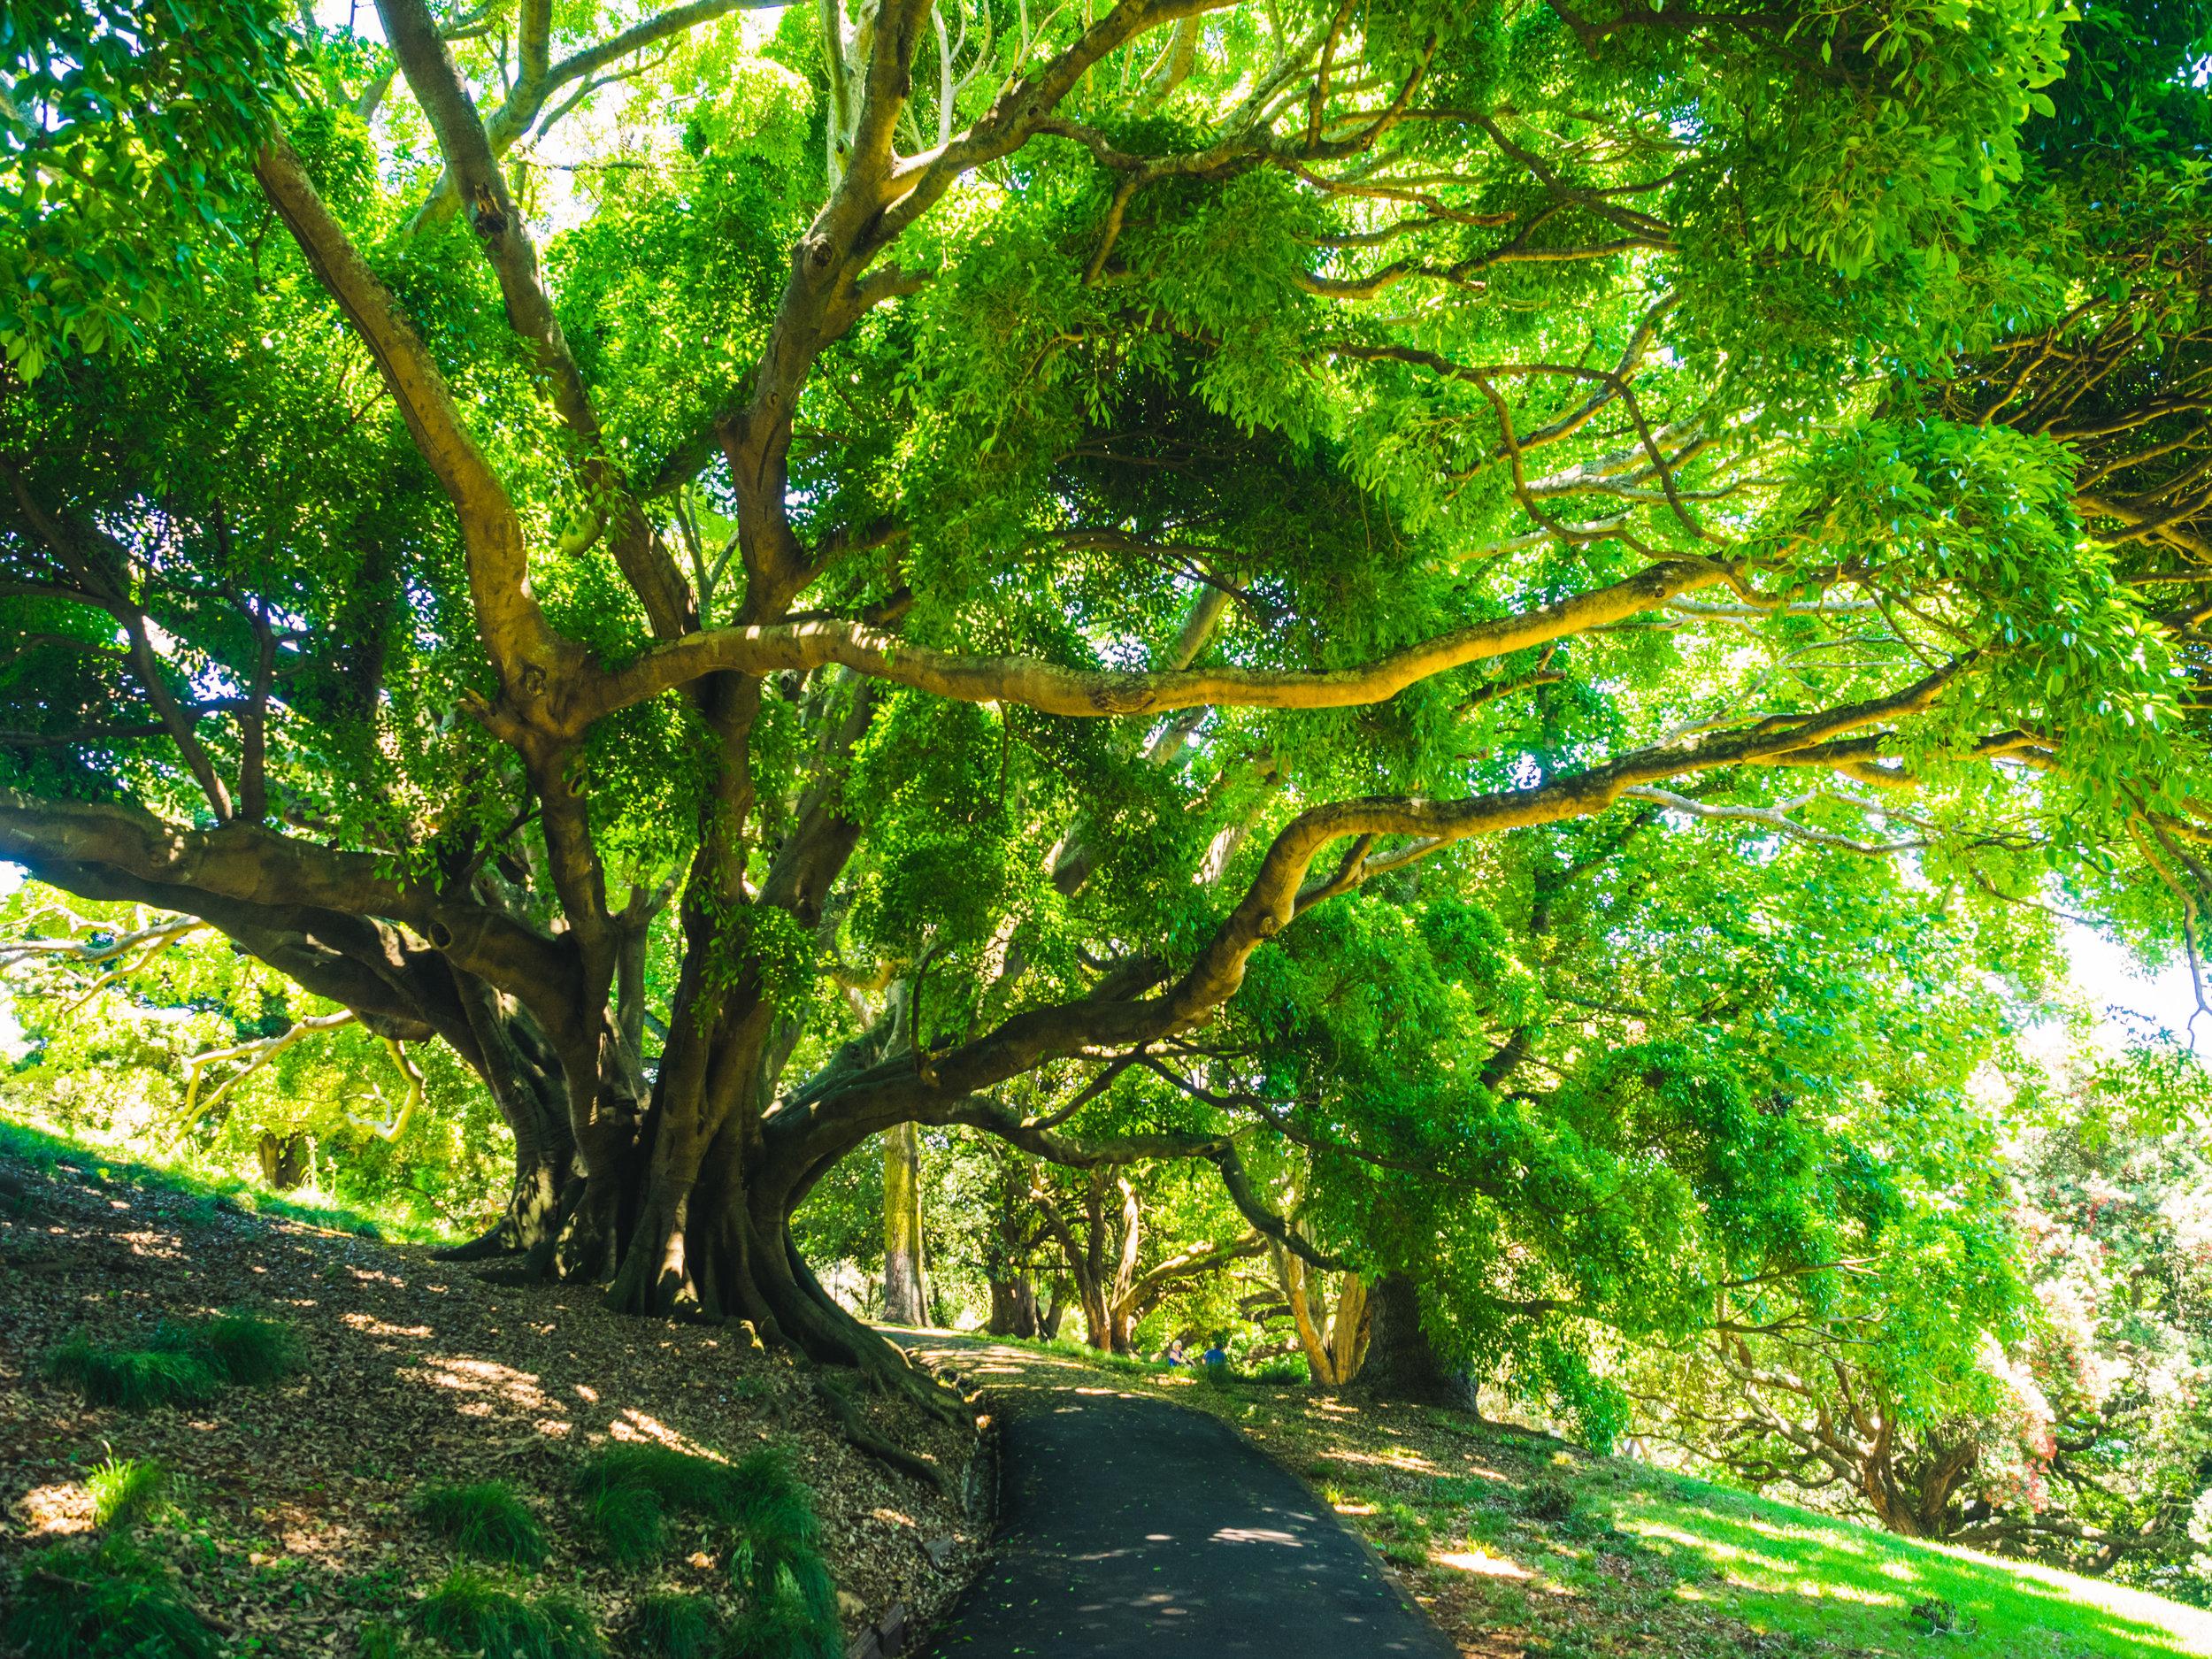 trees in Albert Park - Massive!